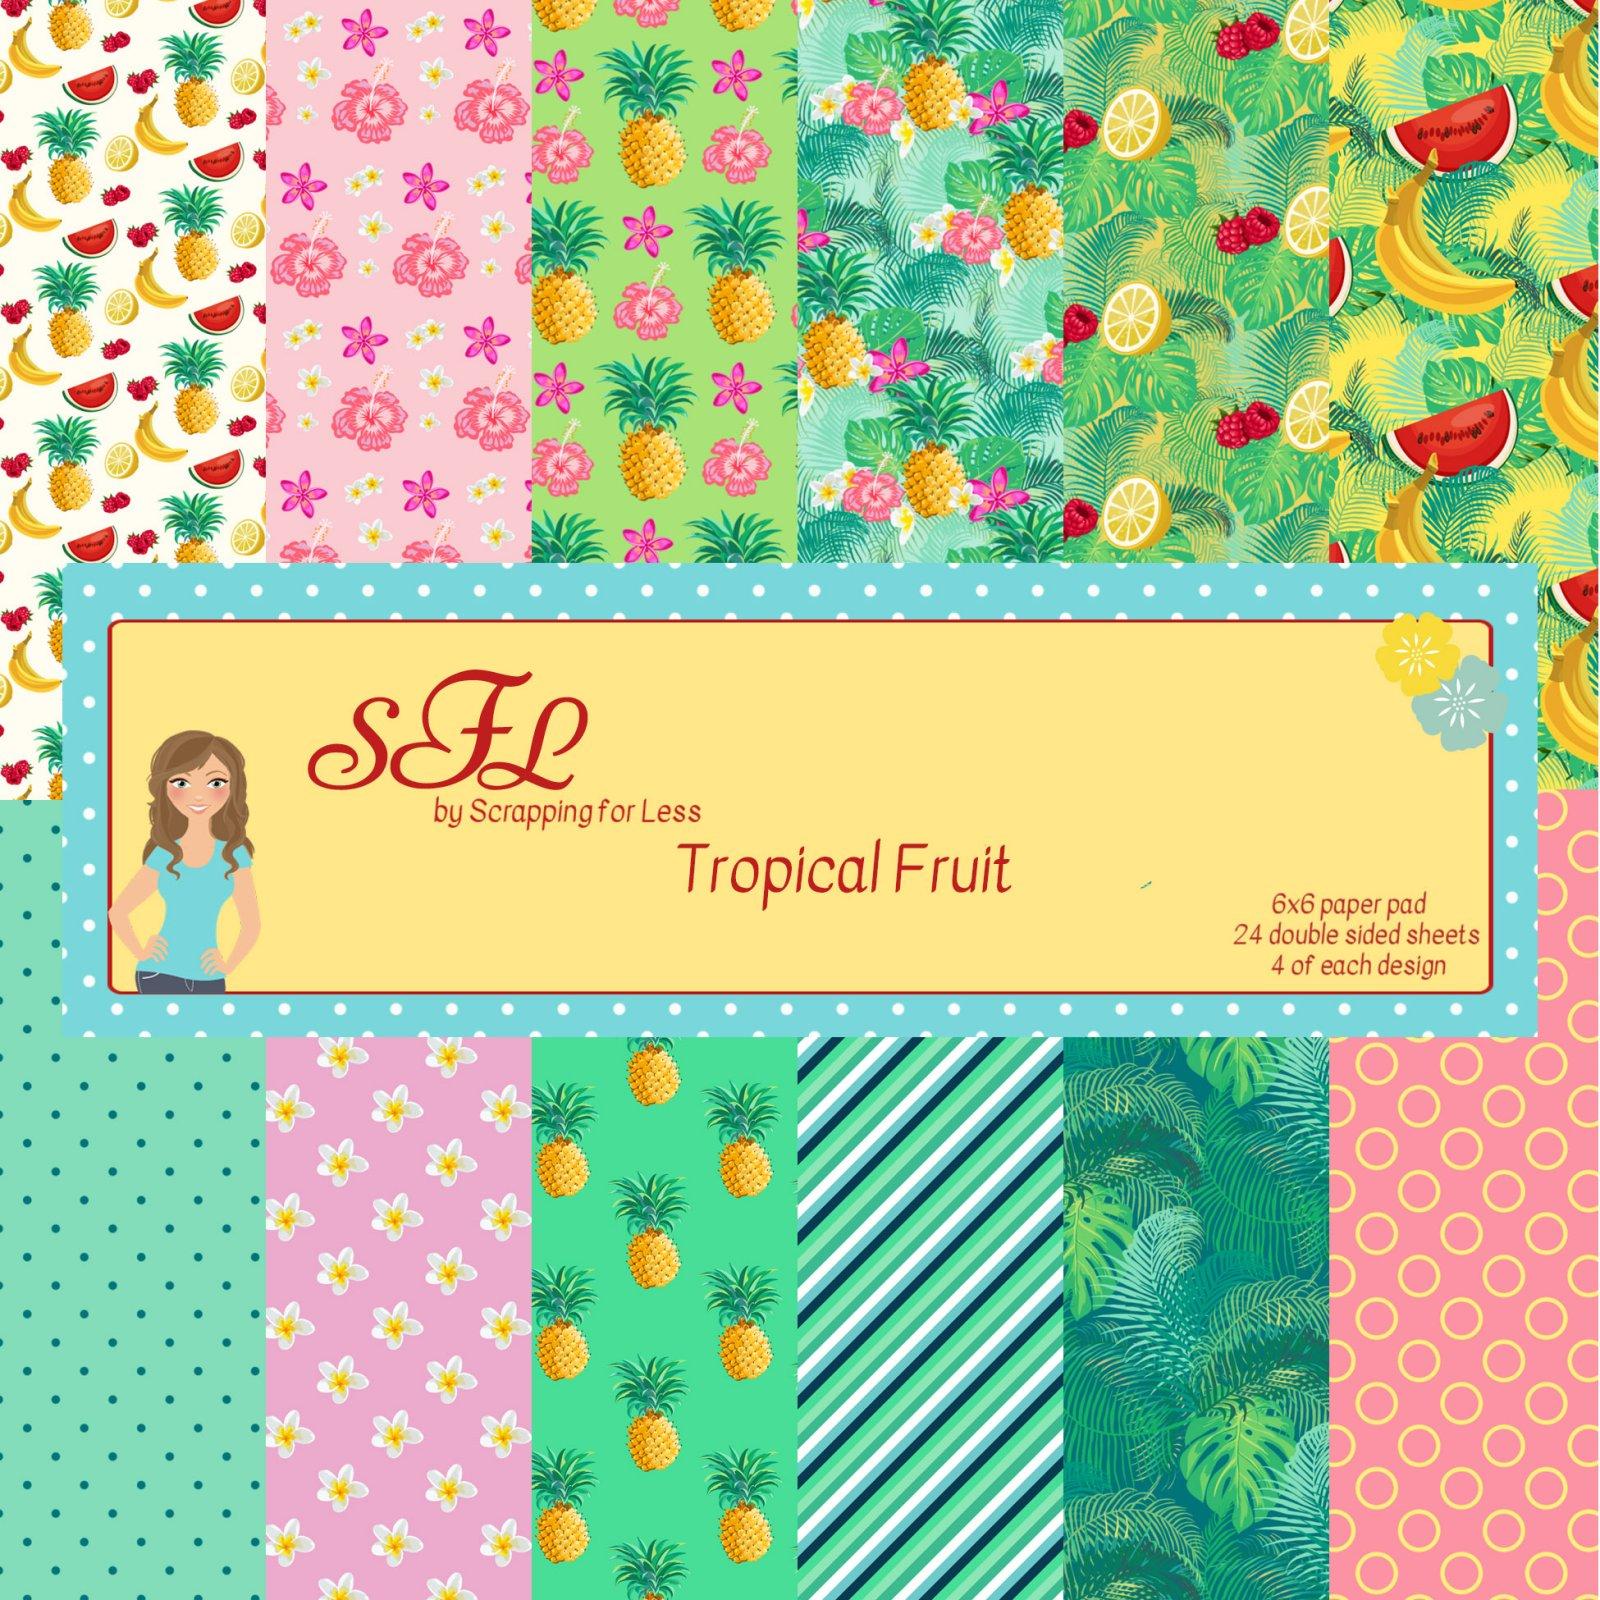 SFL Tropical Fruit 6x6 Paper Pad